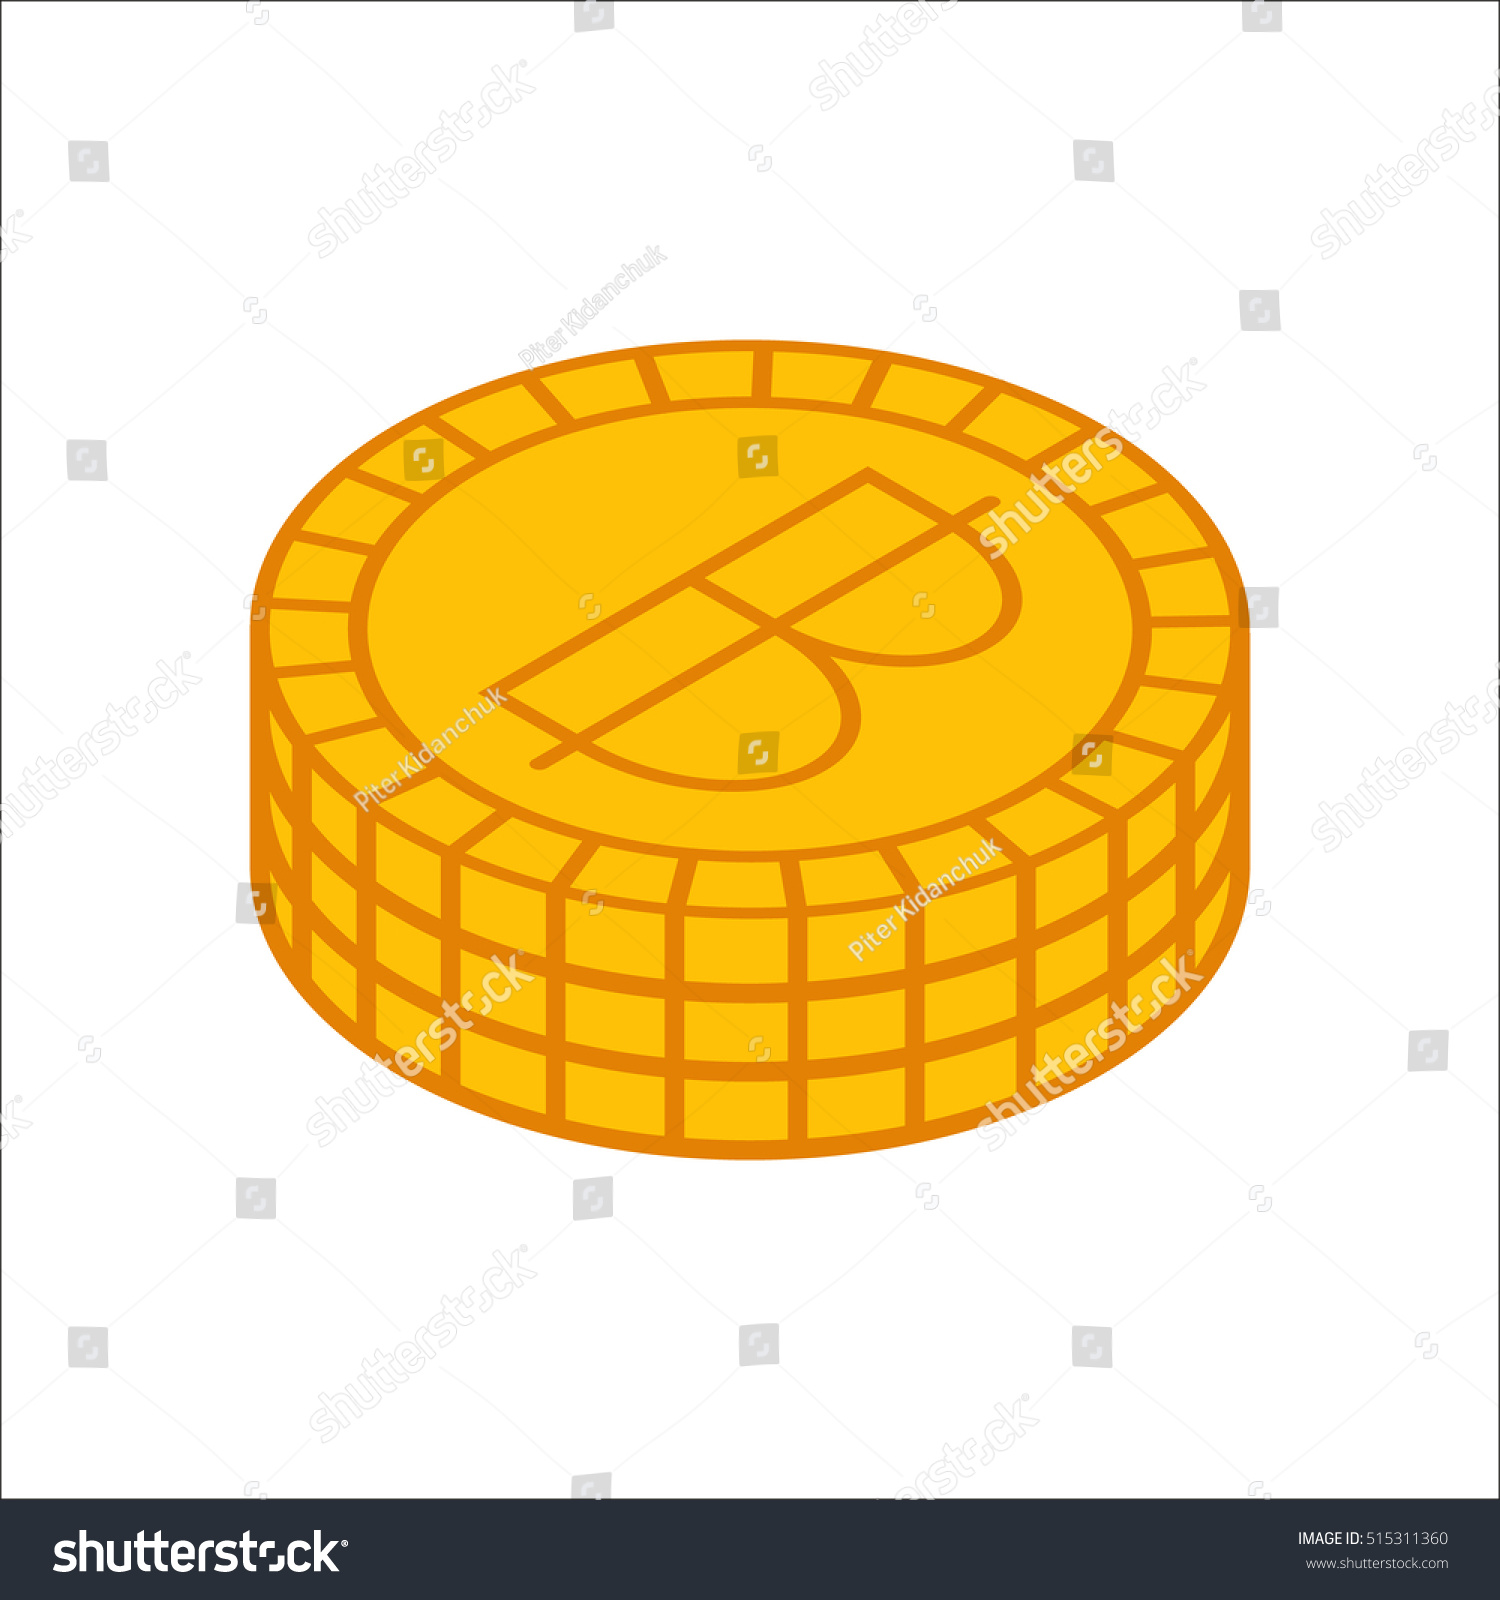 Thai Baht Coins Symbol Sign Flat Stock Photo Photo Vector